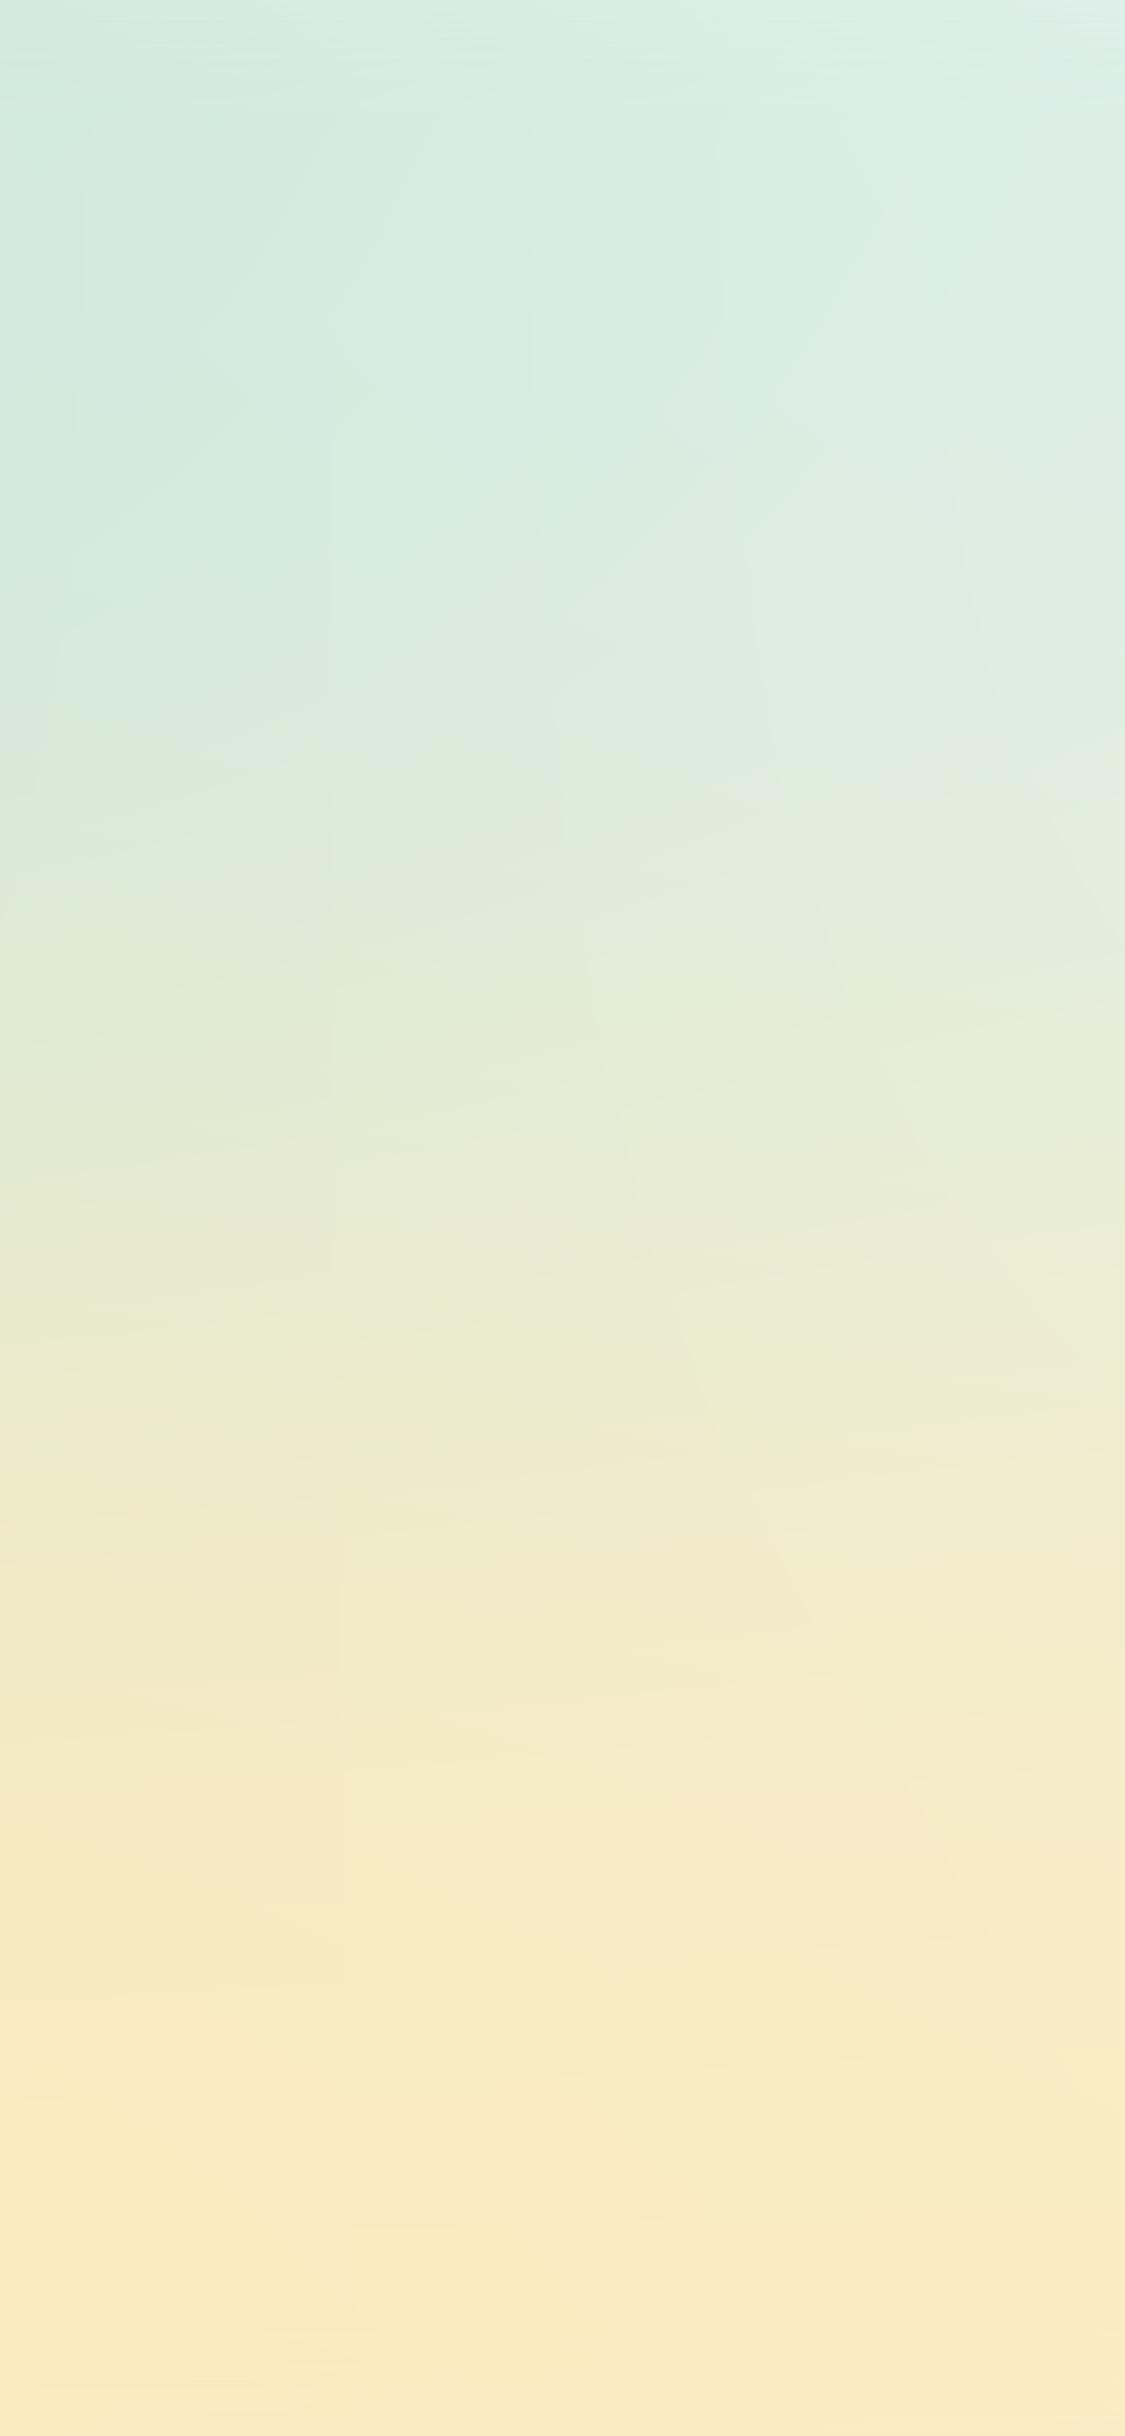 iPhonexpapers.com-Apple-iPhone-wallpaper-sm54-pastel-yellow-morning-blur-gradation